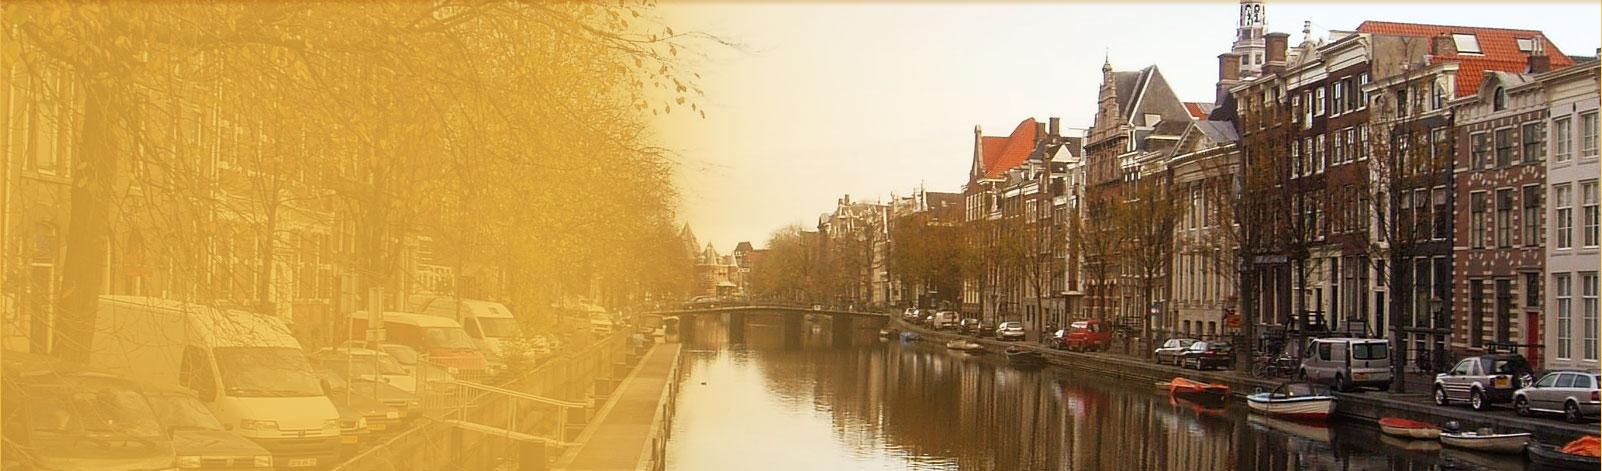 Kuliah di Belanda dalam Bahasa Inggris